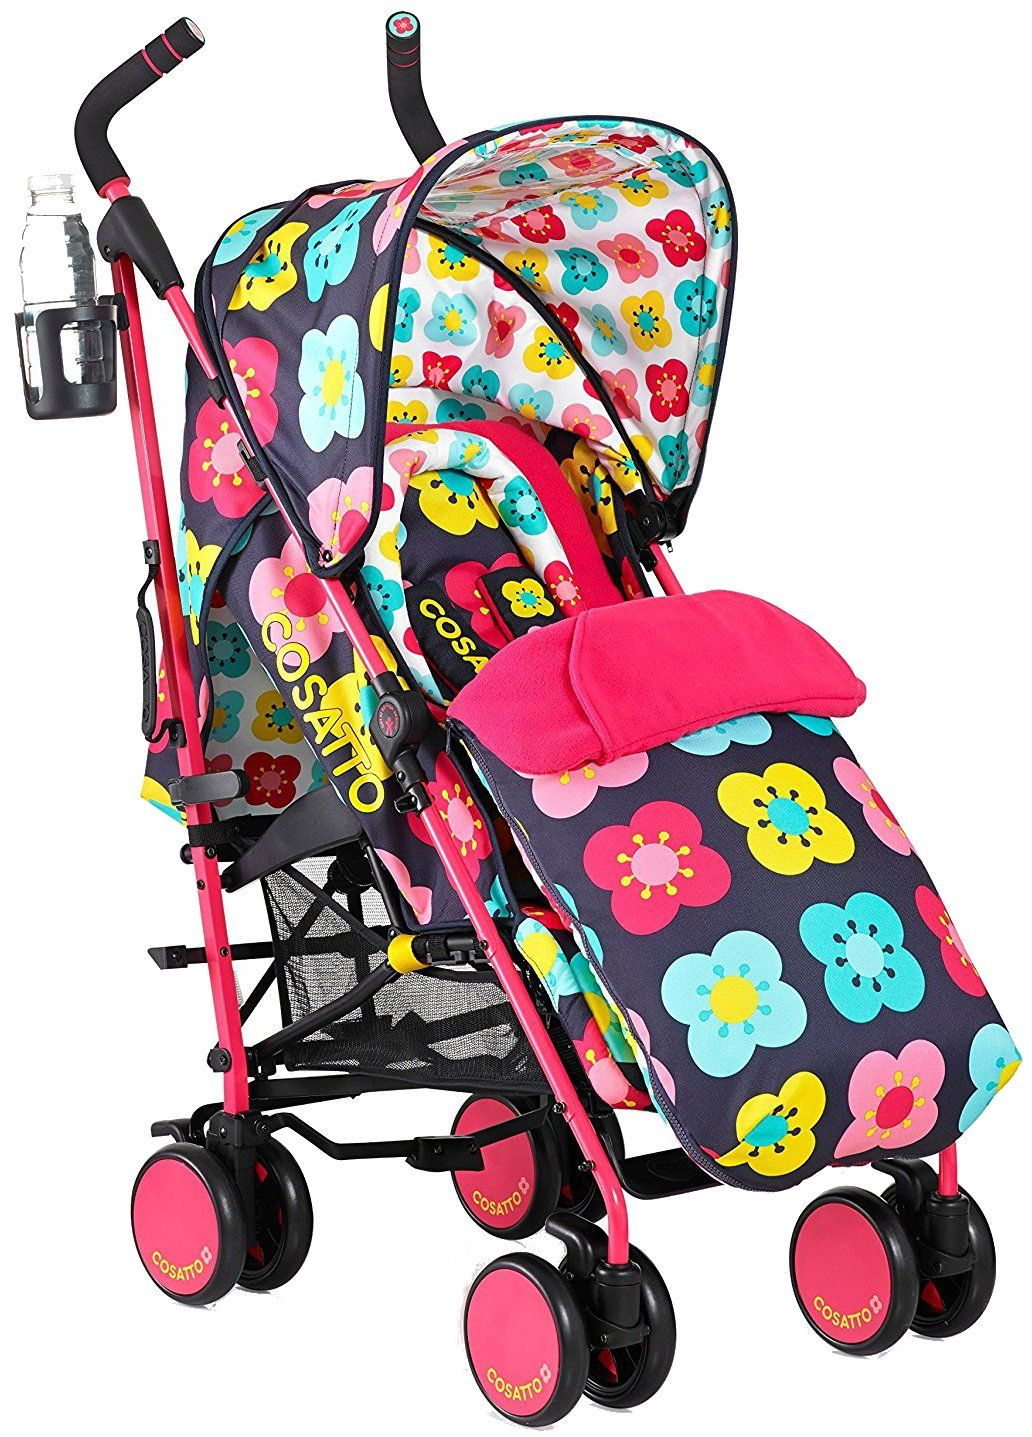 Supa Stroller Poppidelec pushchair parents